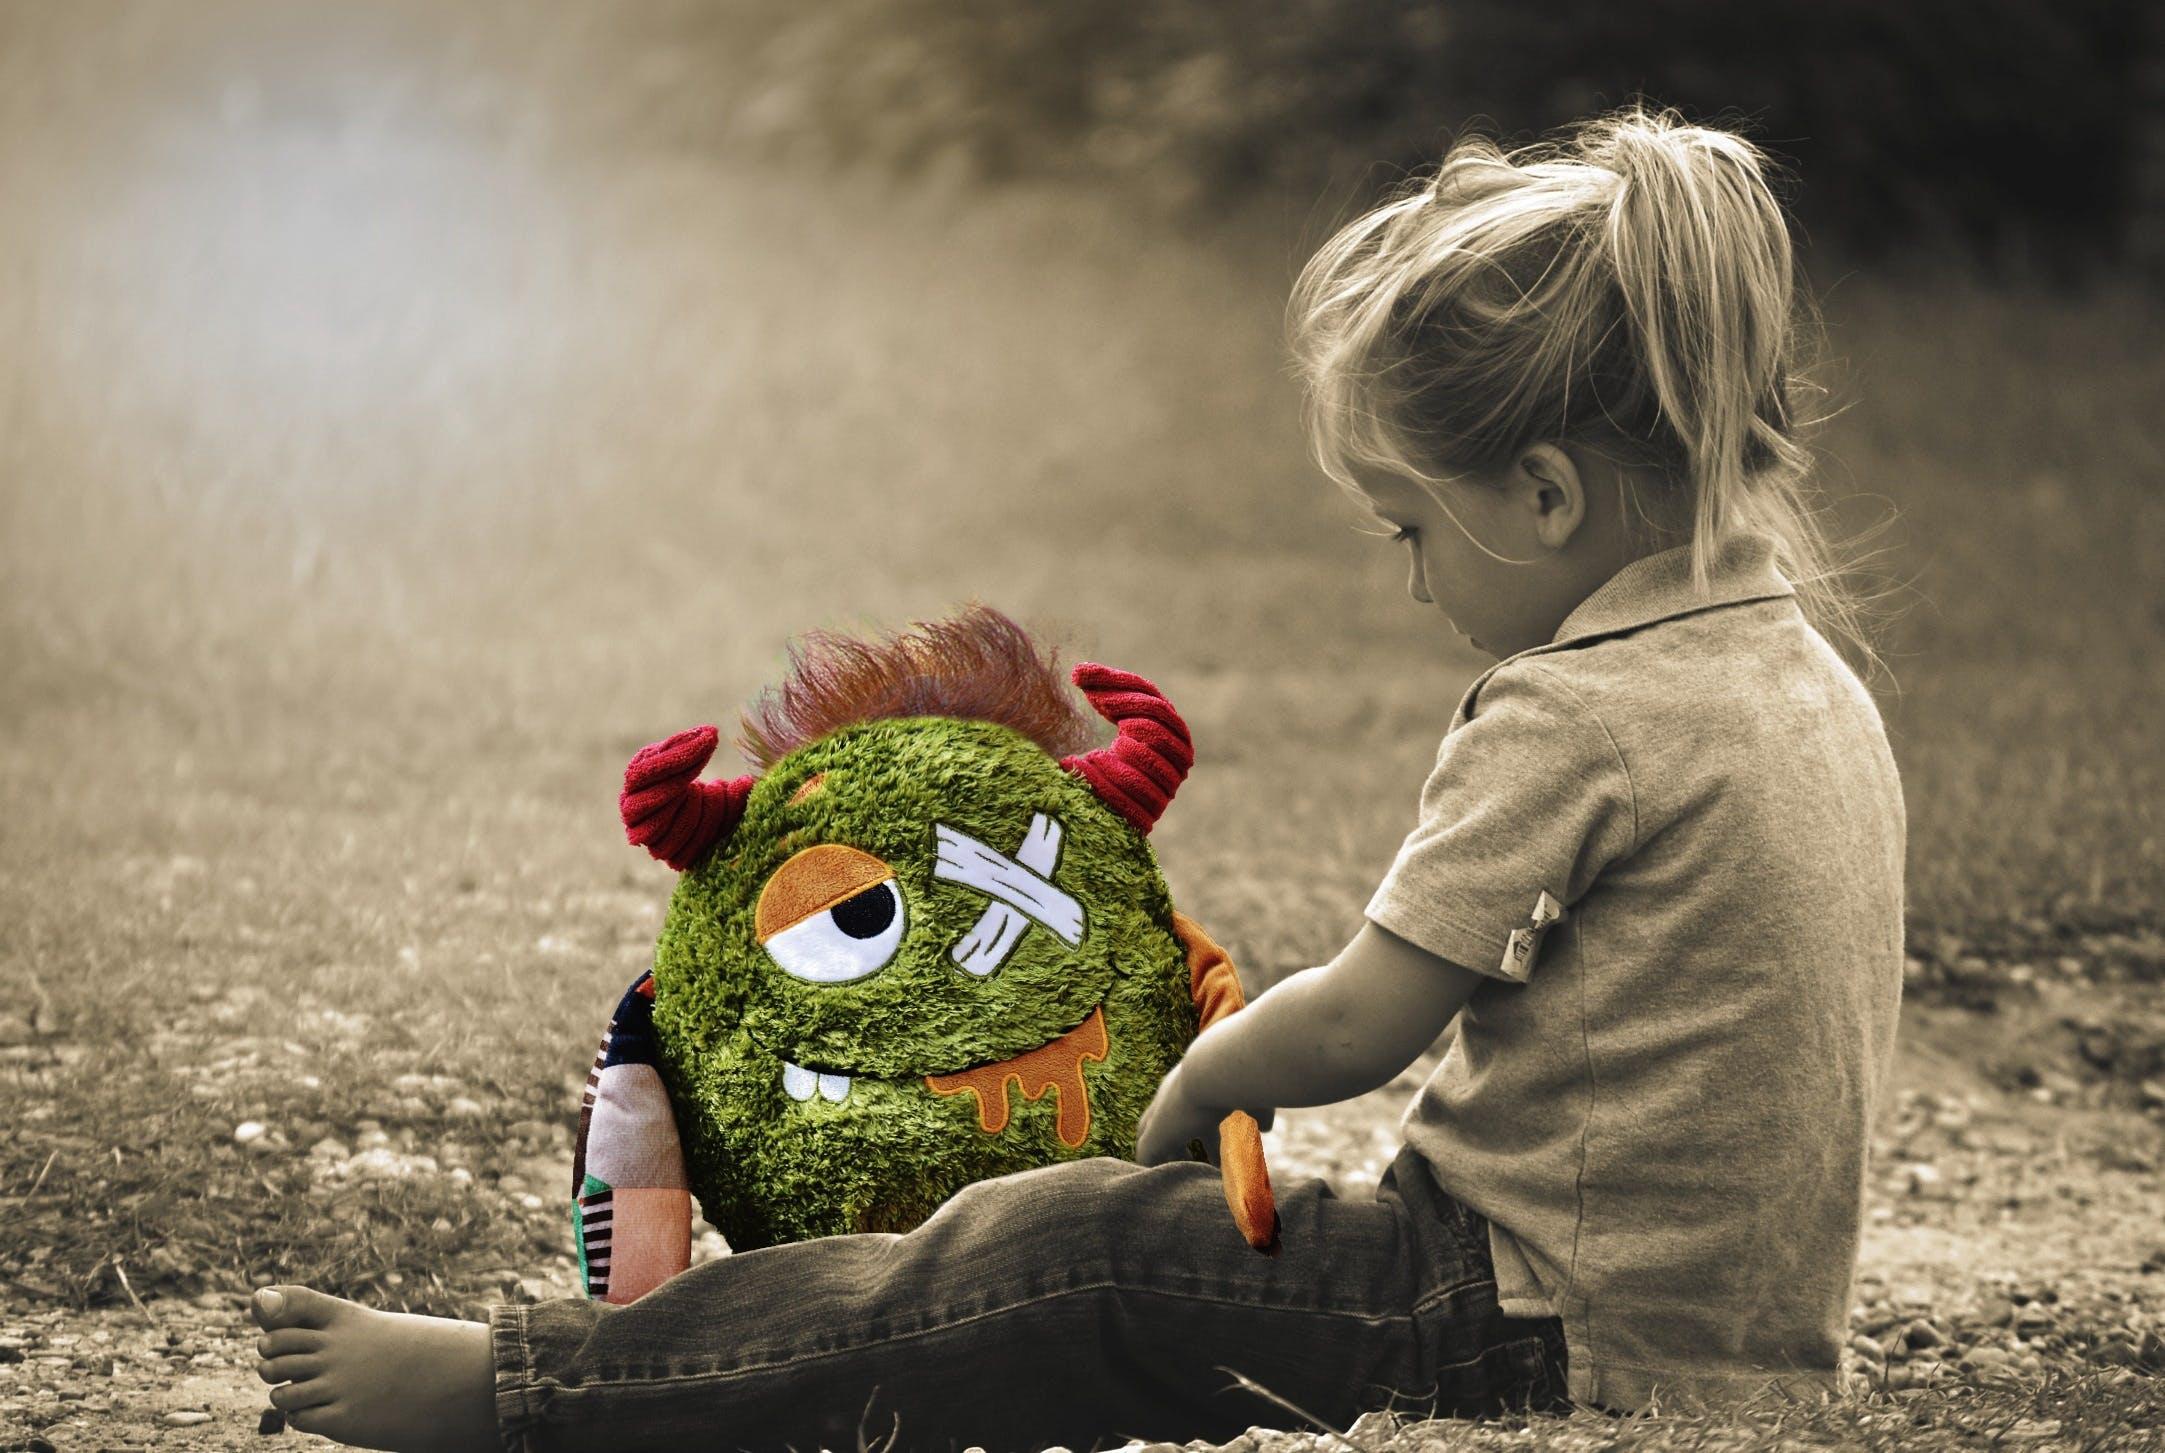 Free stock photo of boo boo, child, childhood, comfort